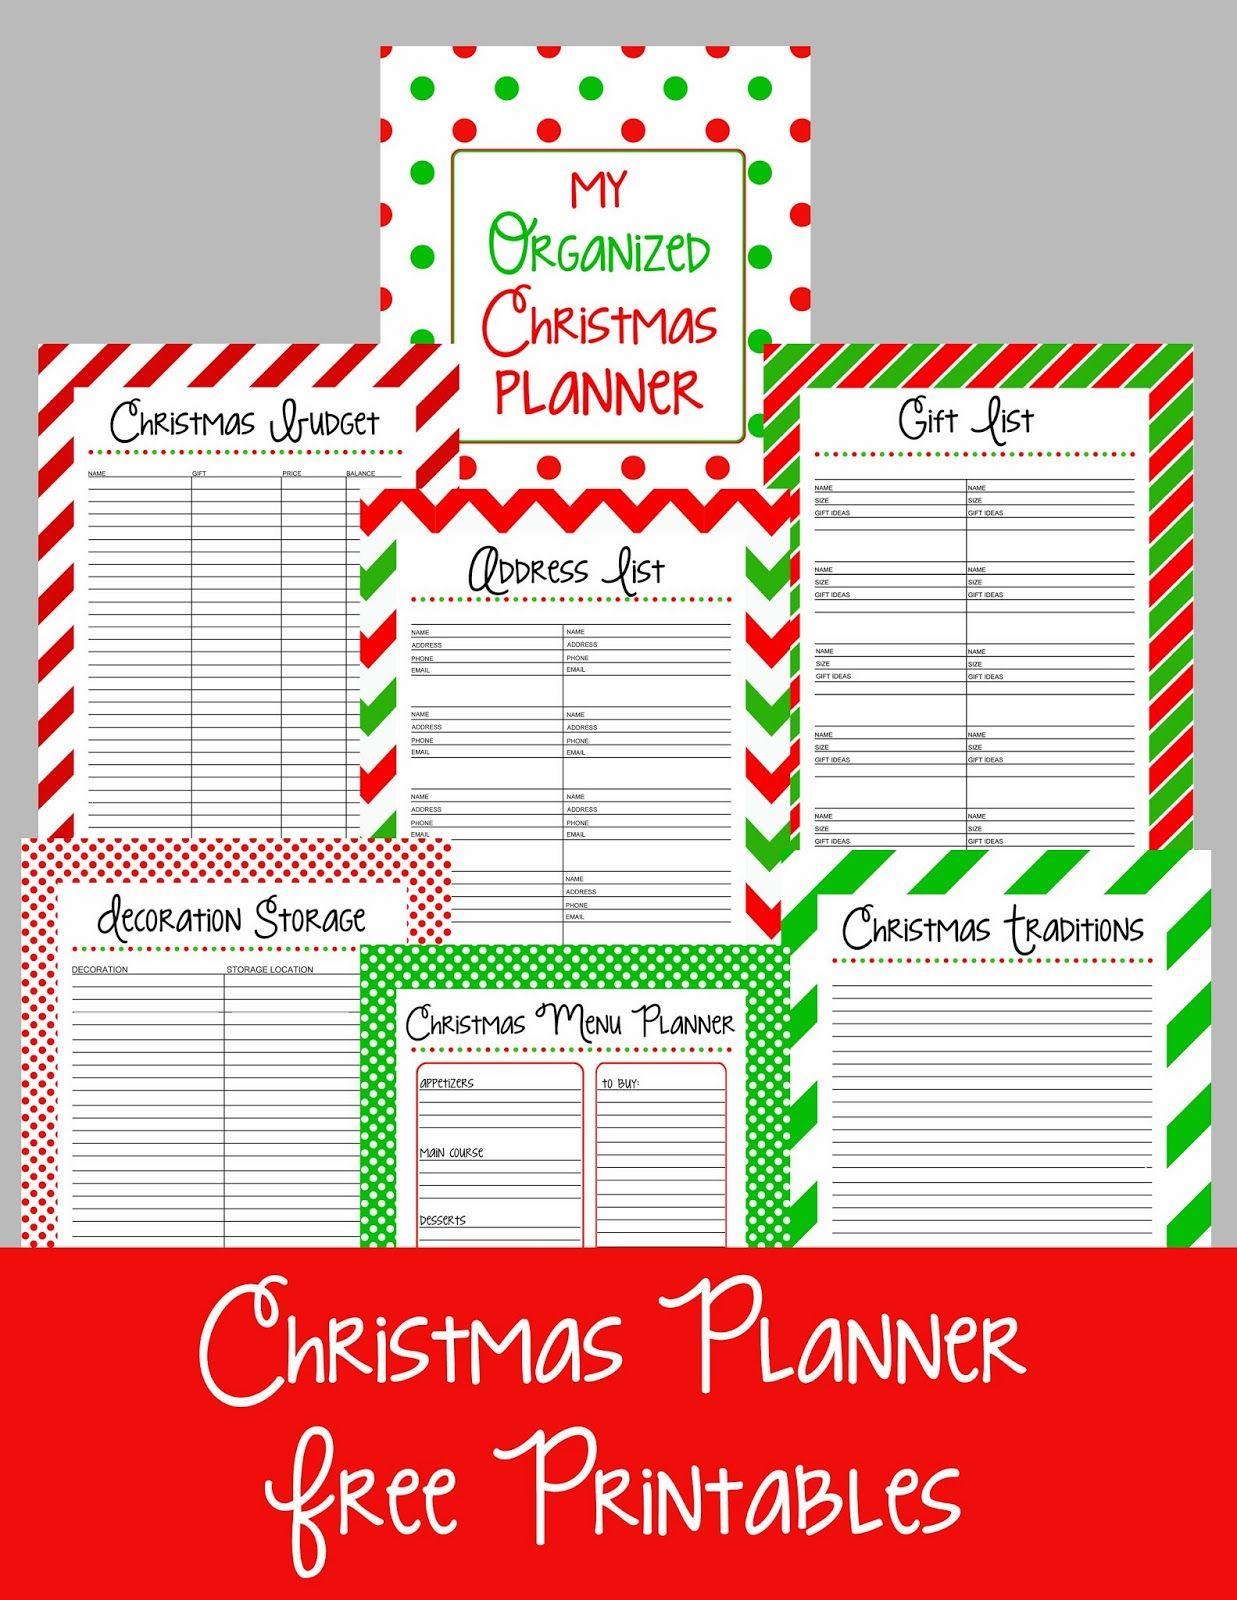 Christmas Planner Free Printables 1 237 1 600 Pixels